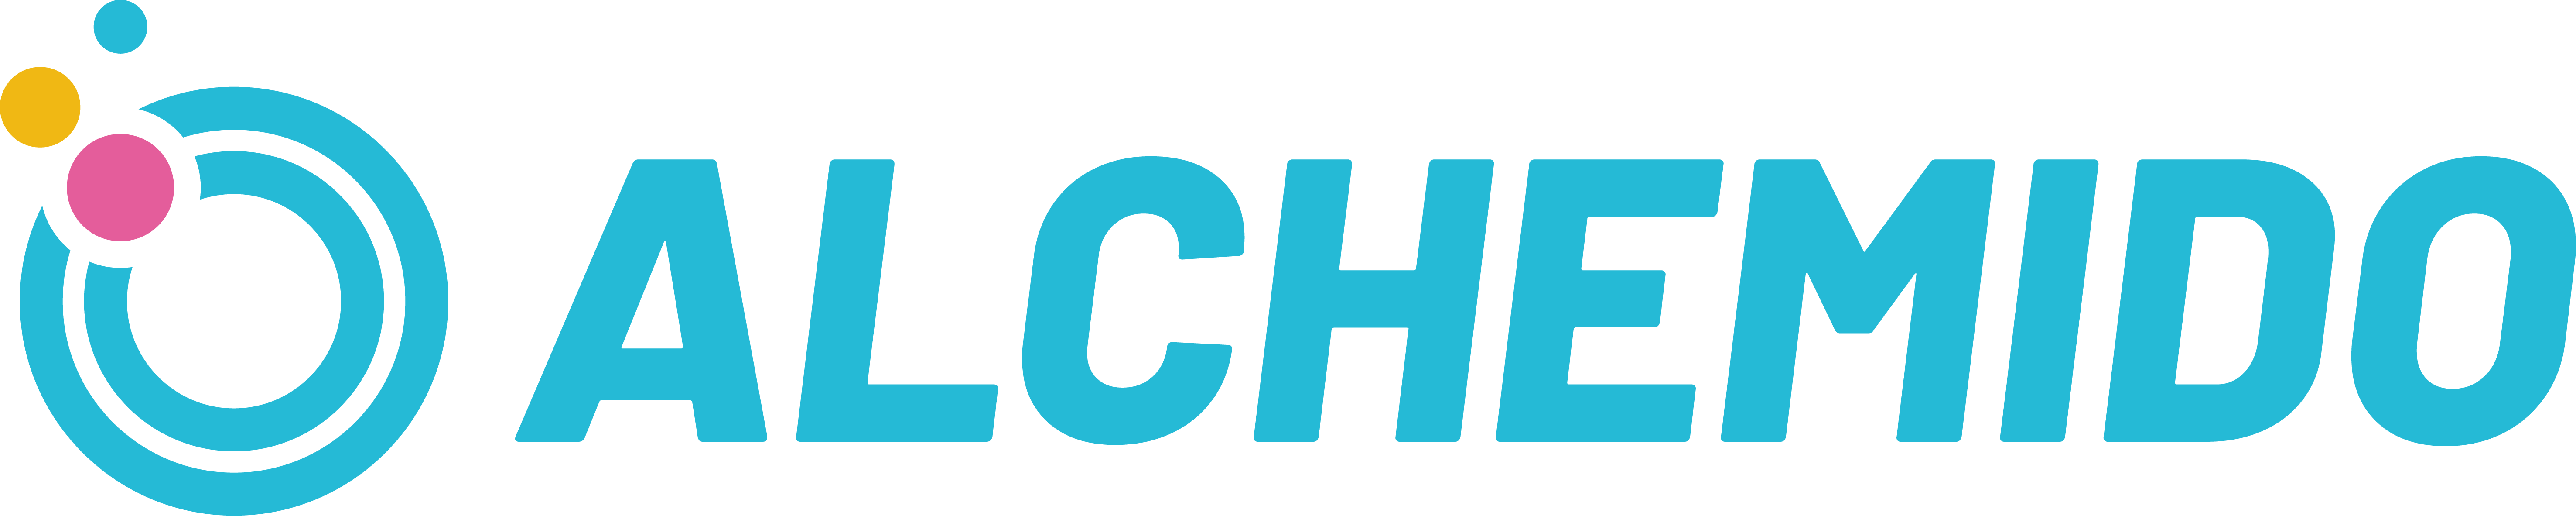 Alchemido